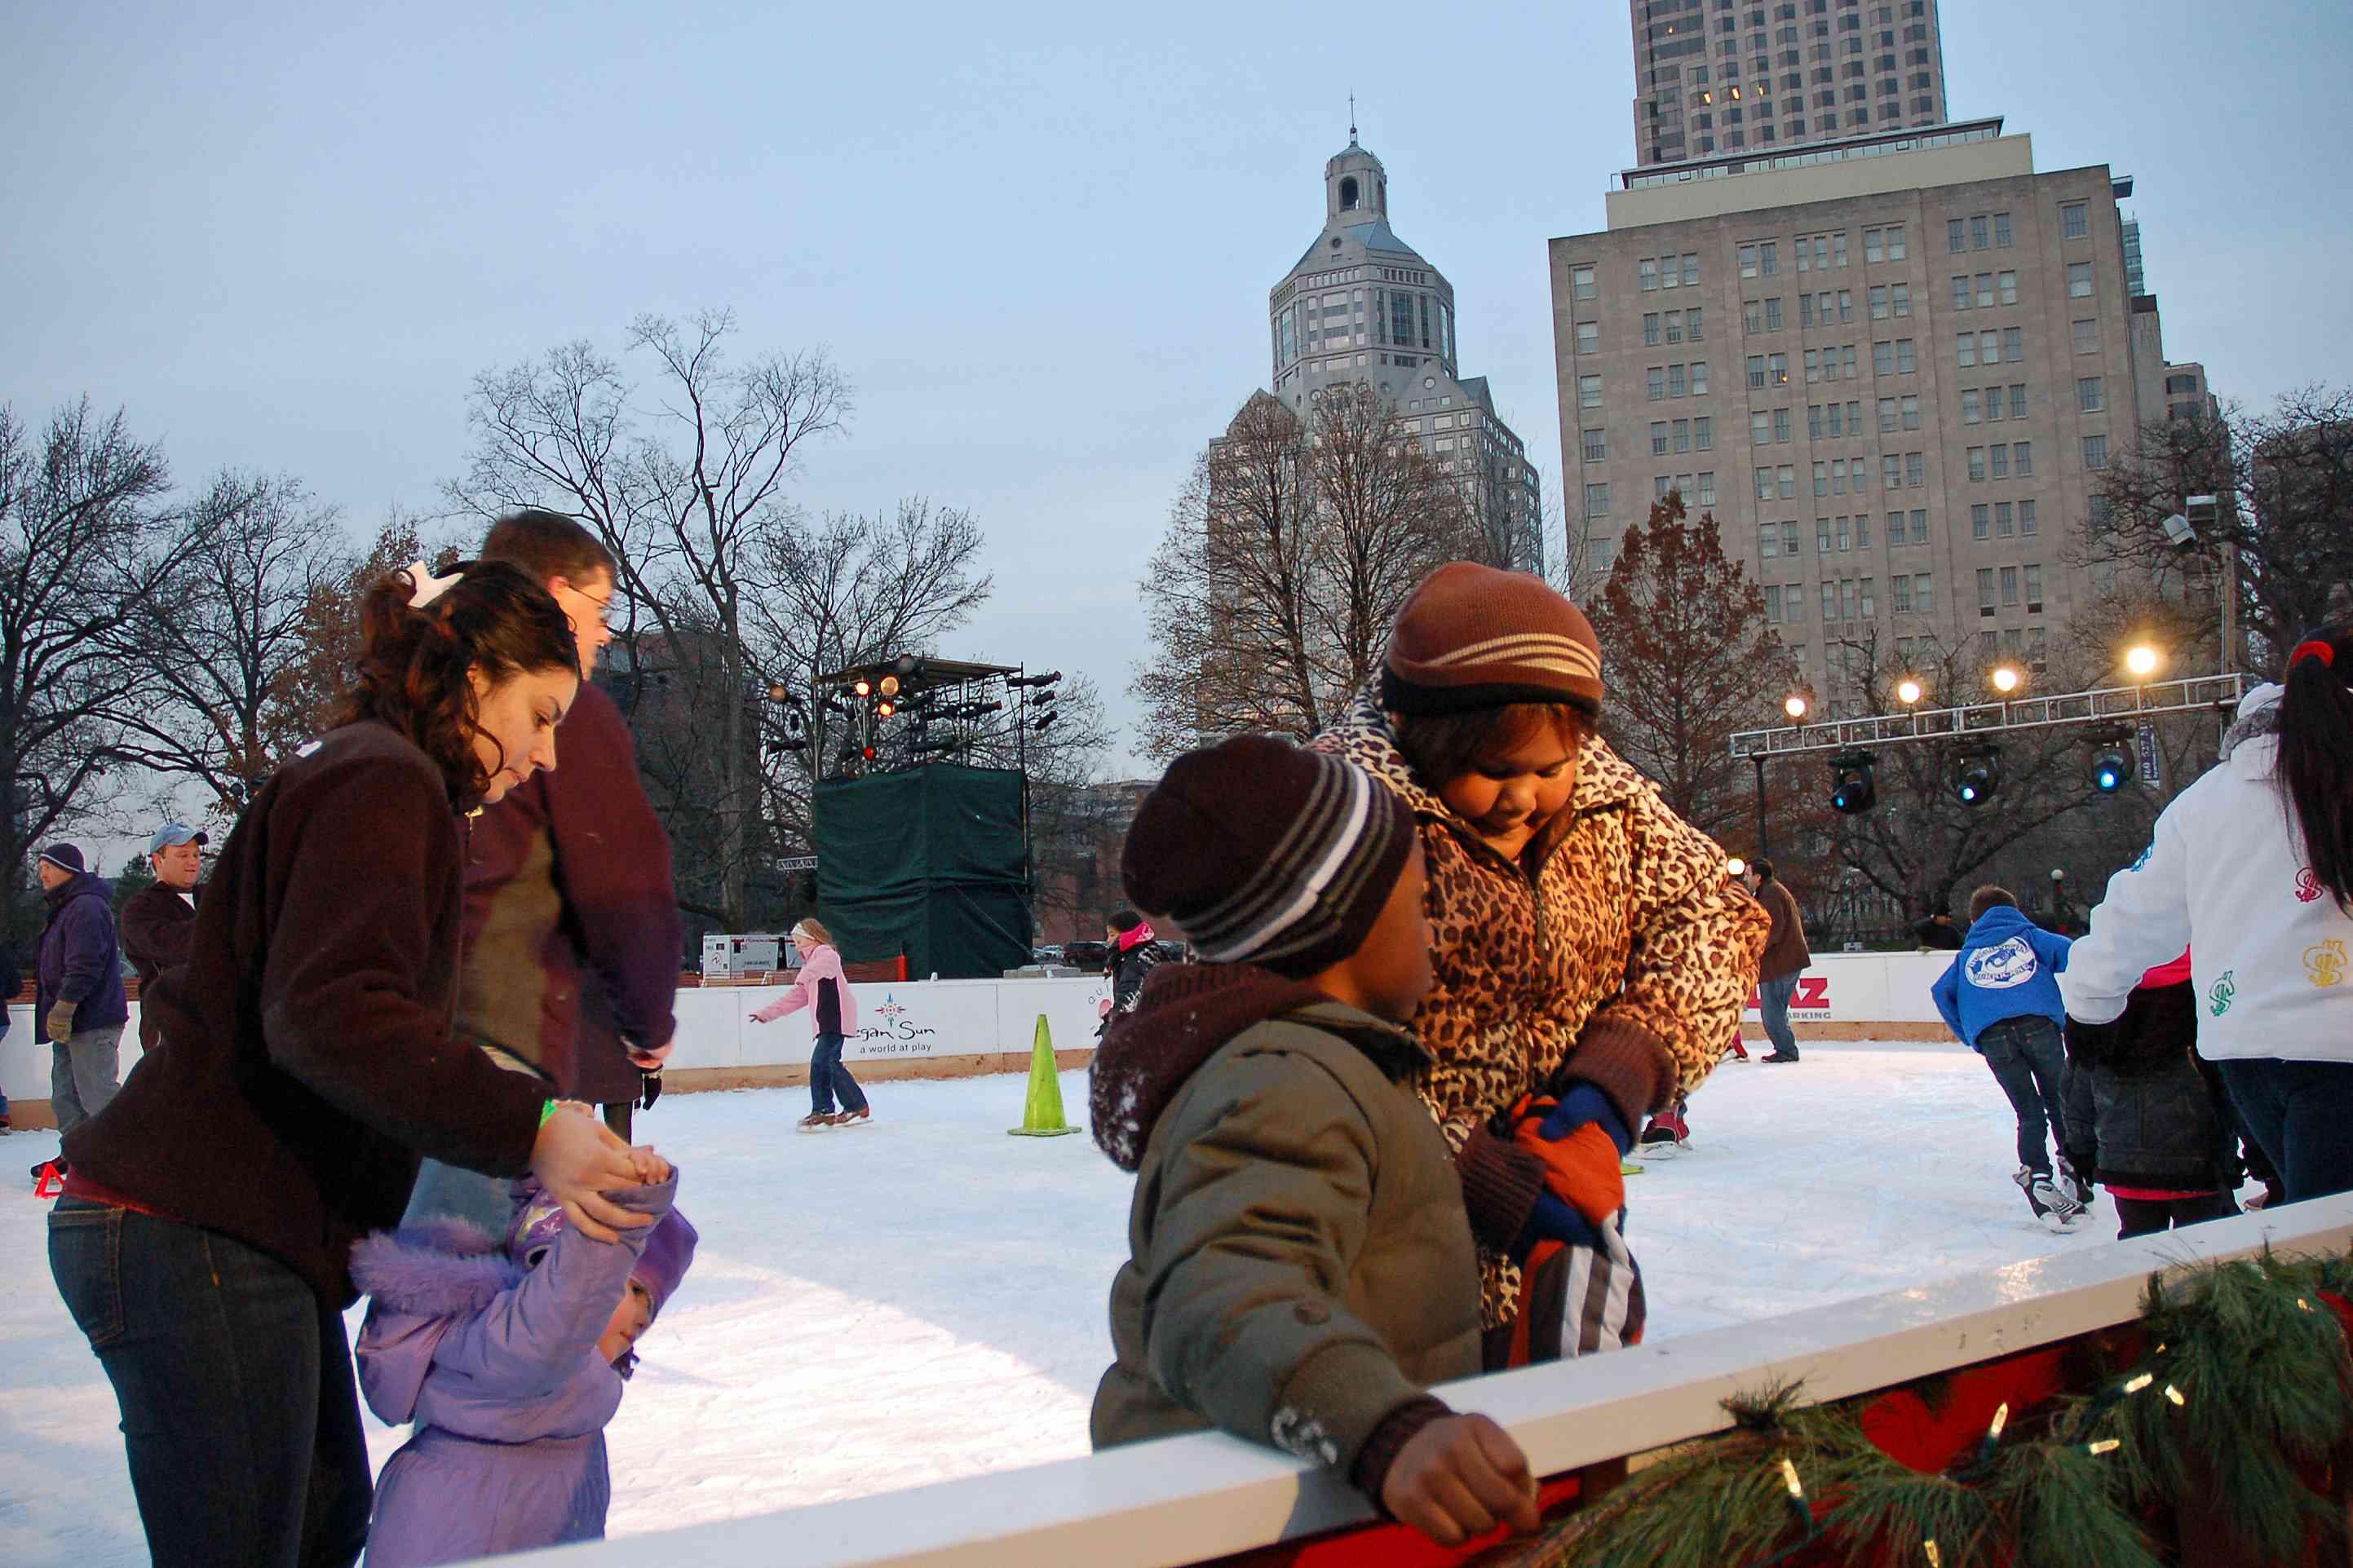 Pista de hielo Winterfest Bushnell Park Hartford